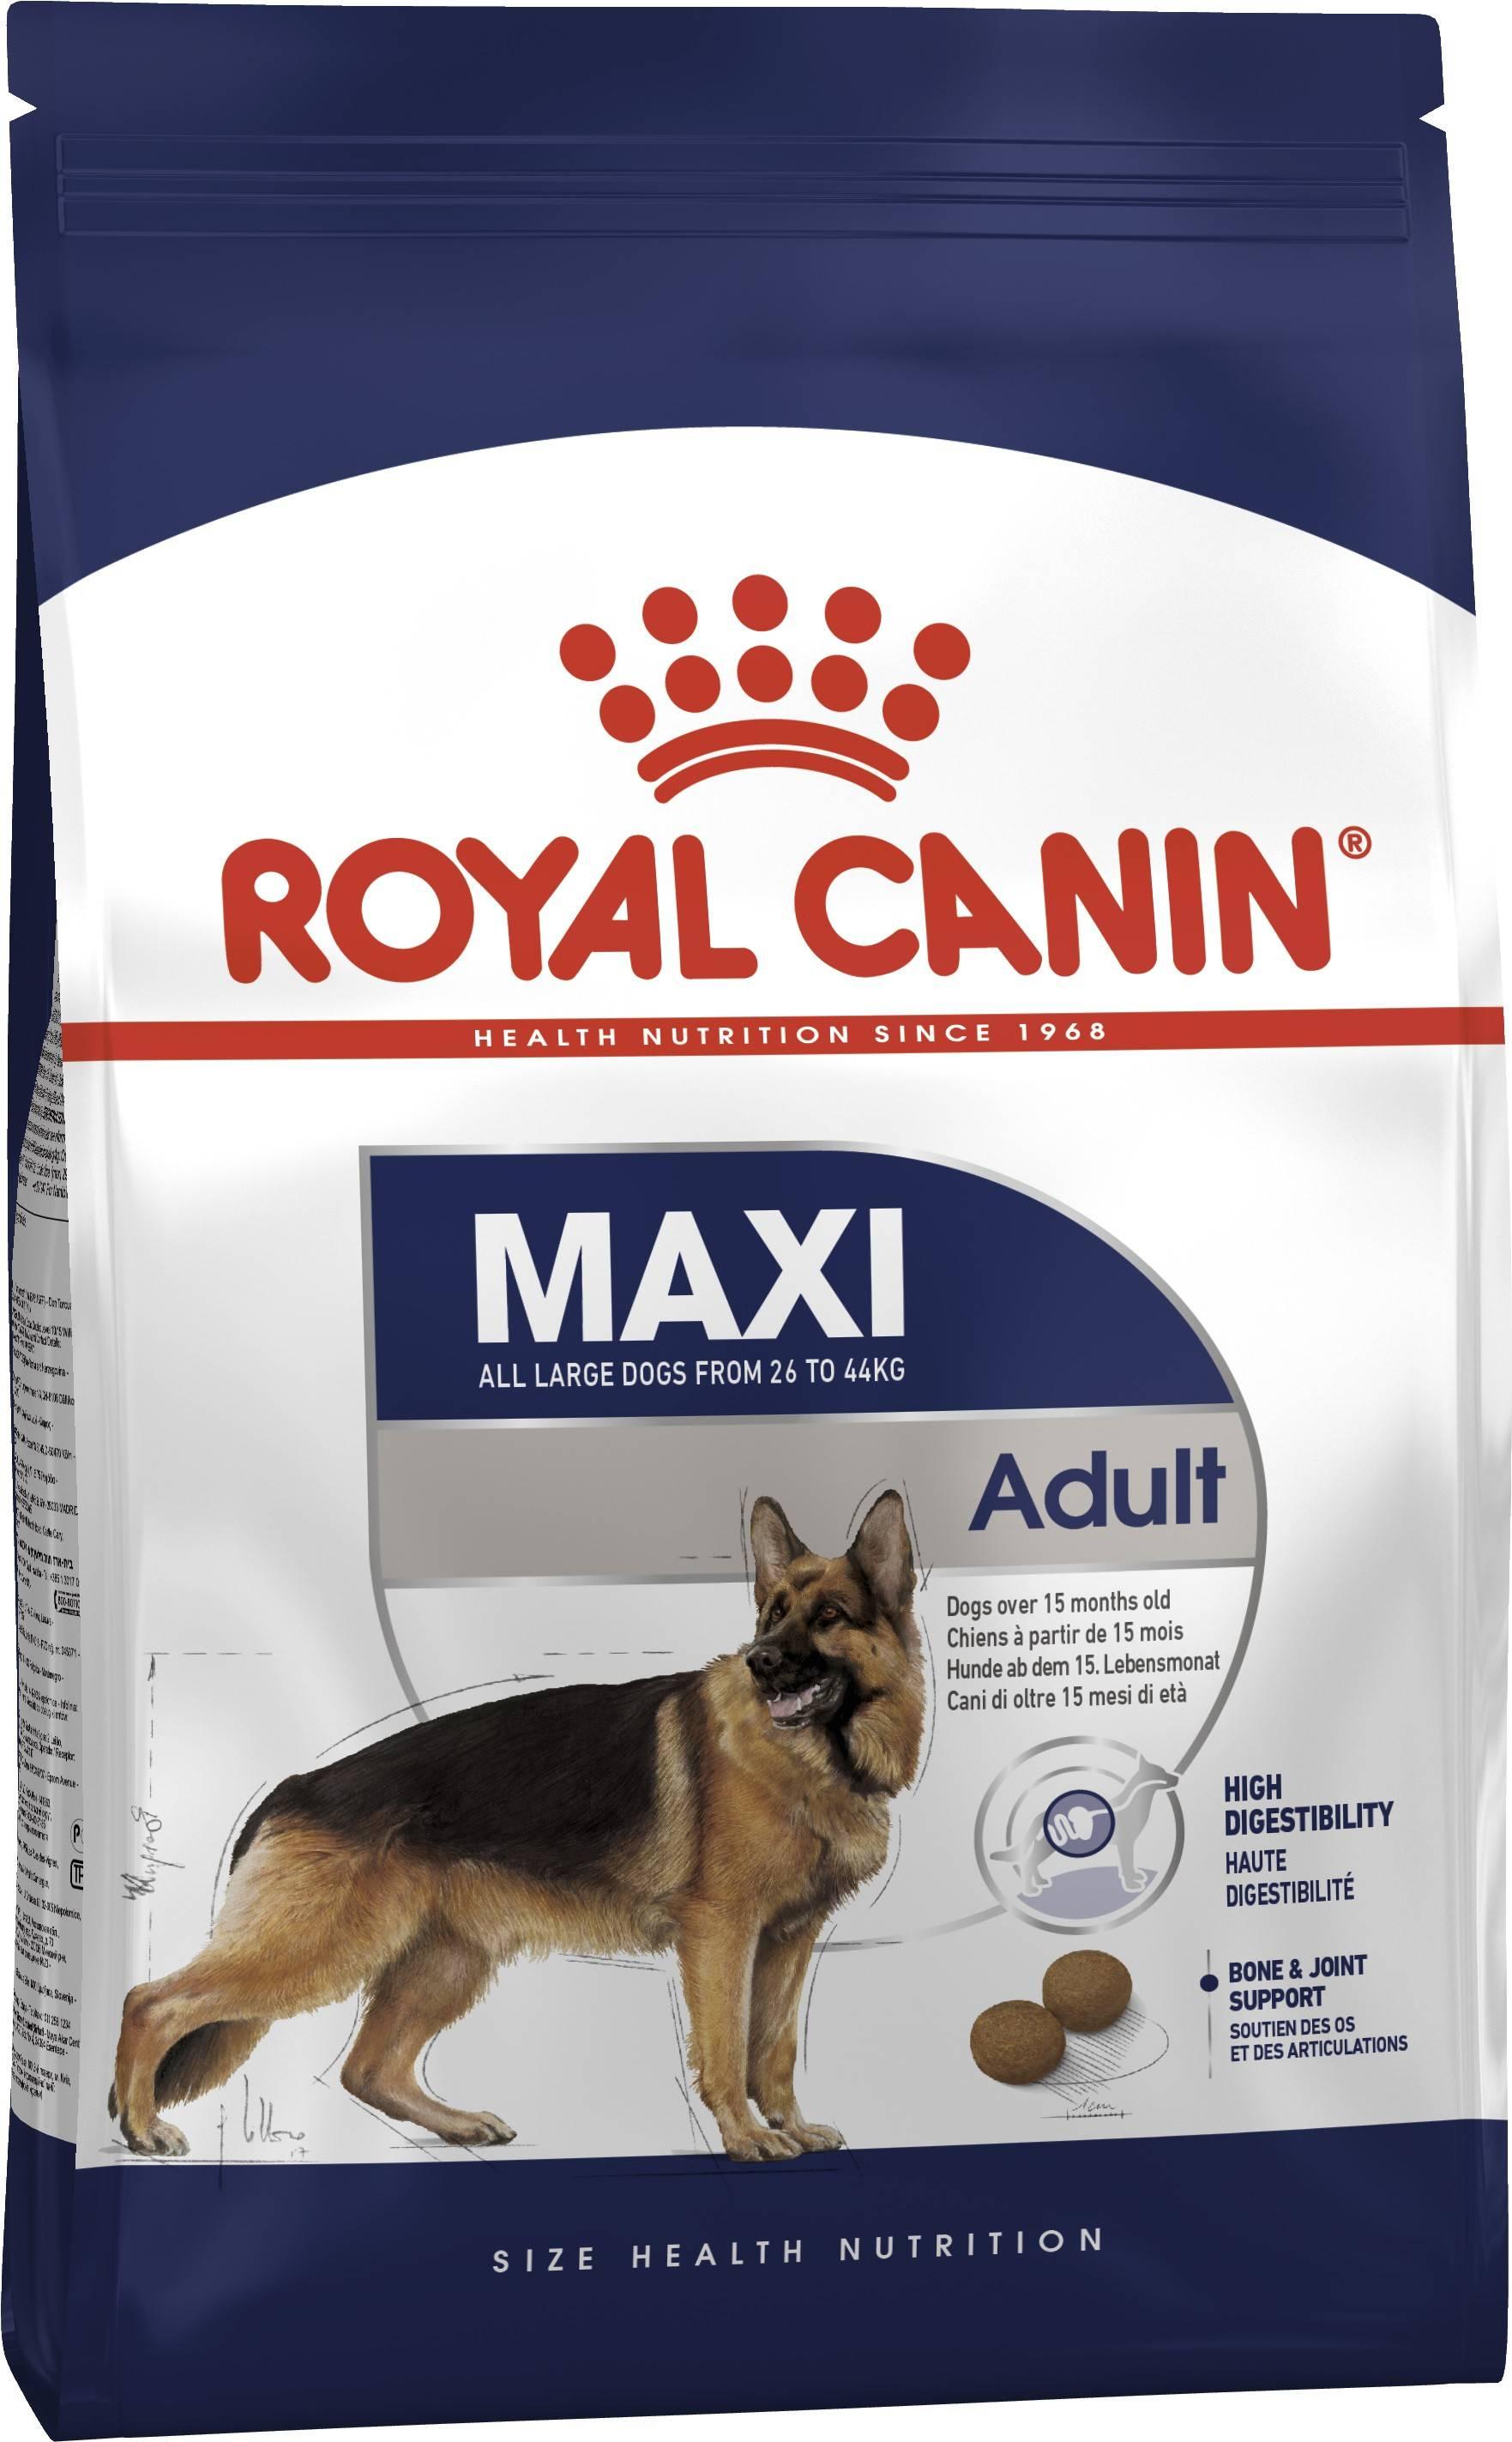 ROYAL CANIN MAXI ADULT – сухий корм для дорослих собак великих порід